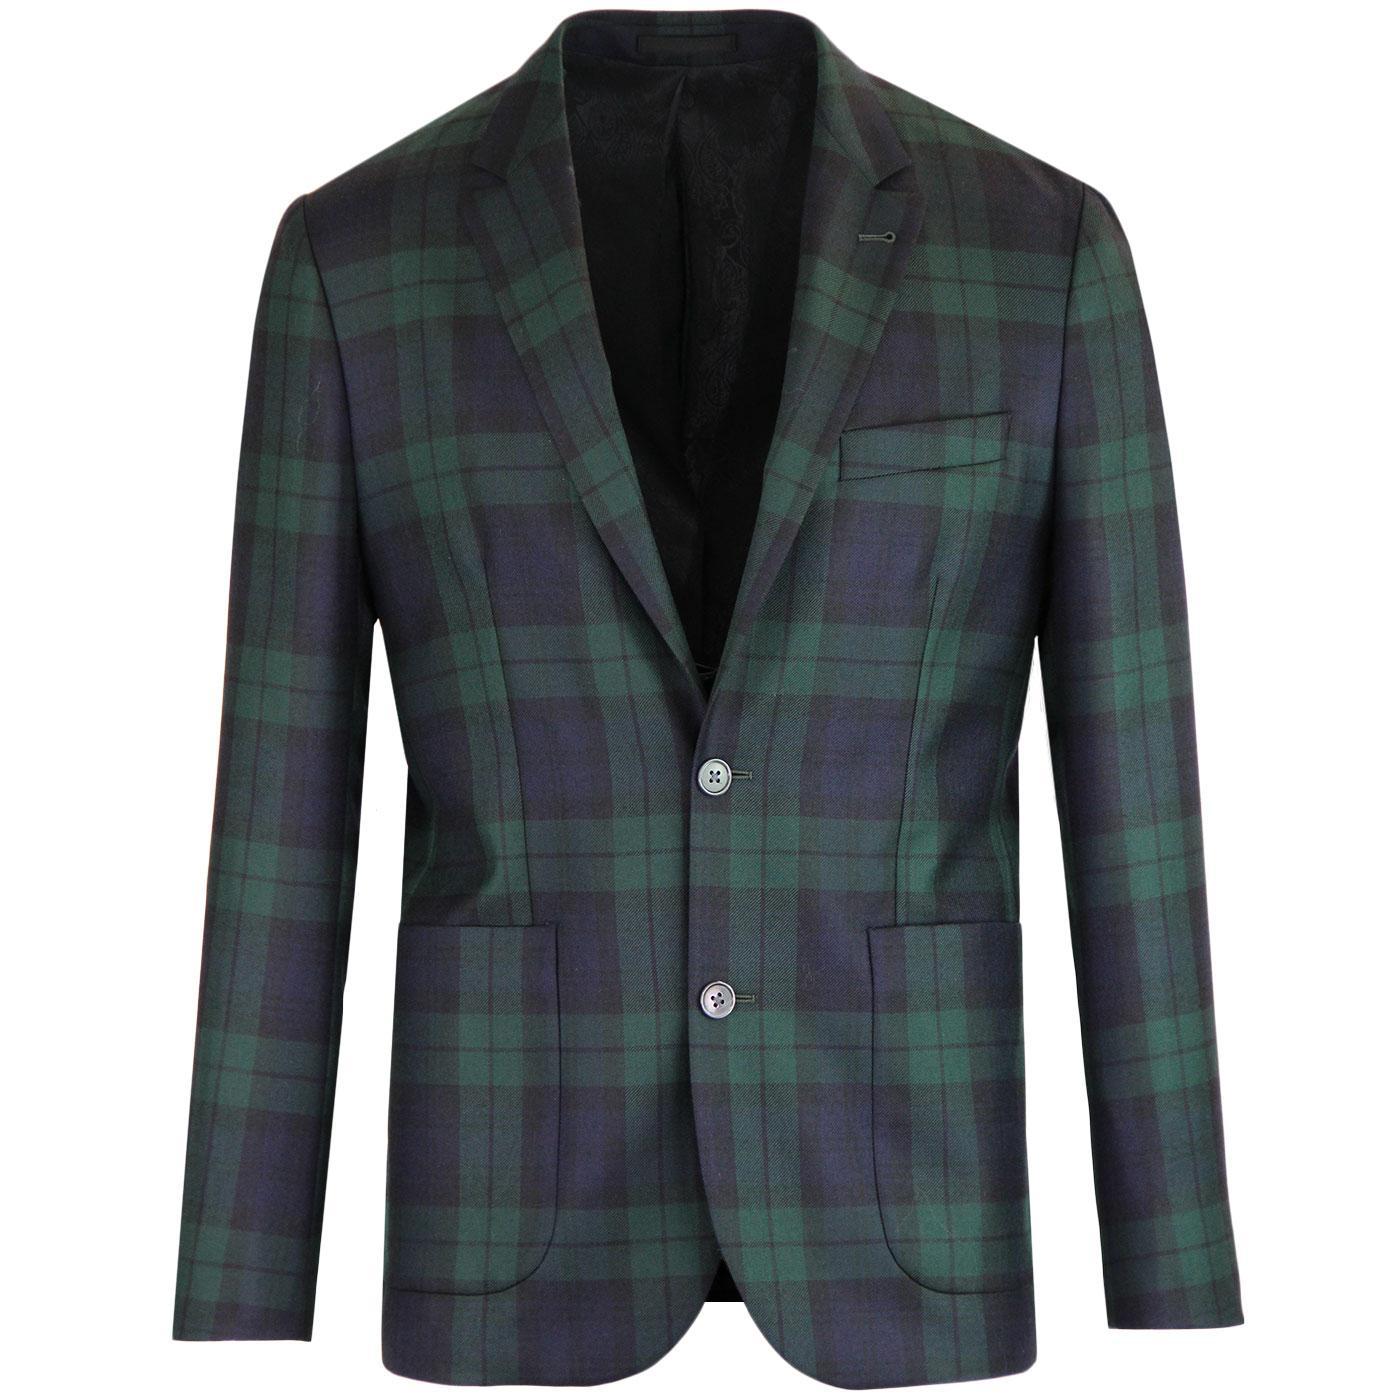 PRETTY GREEN Black Label 60s Mod Check Suit Jacket